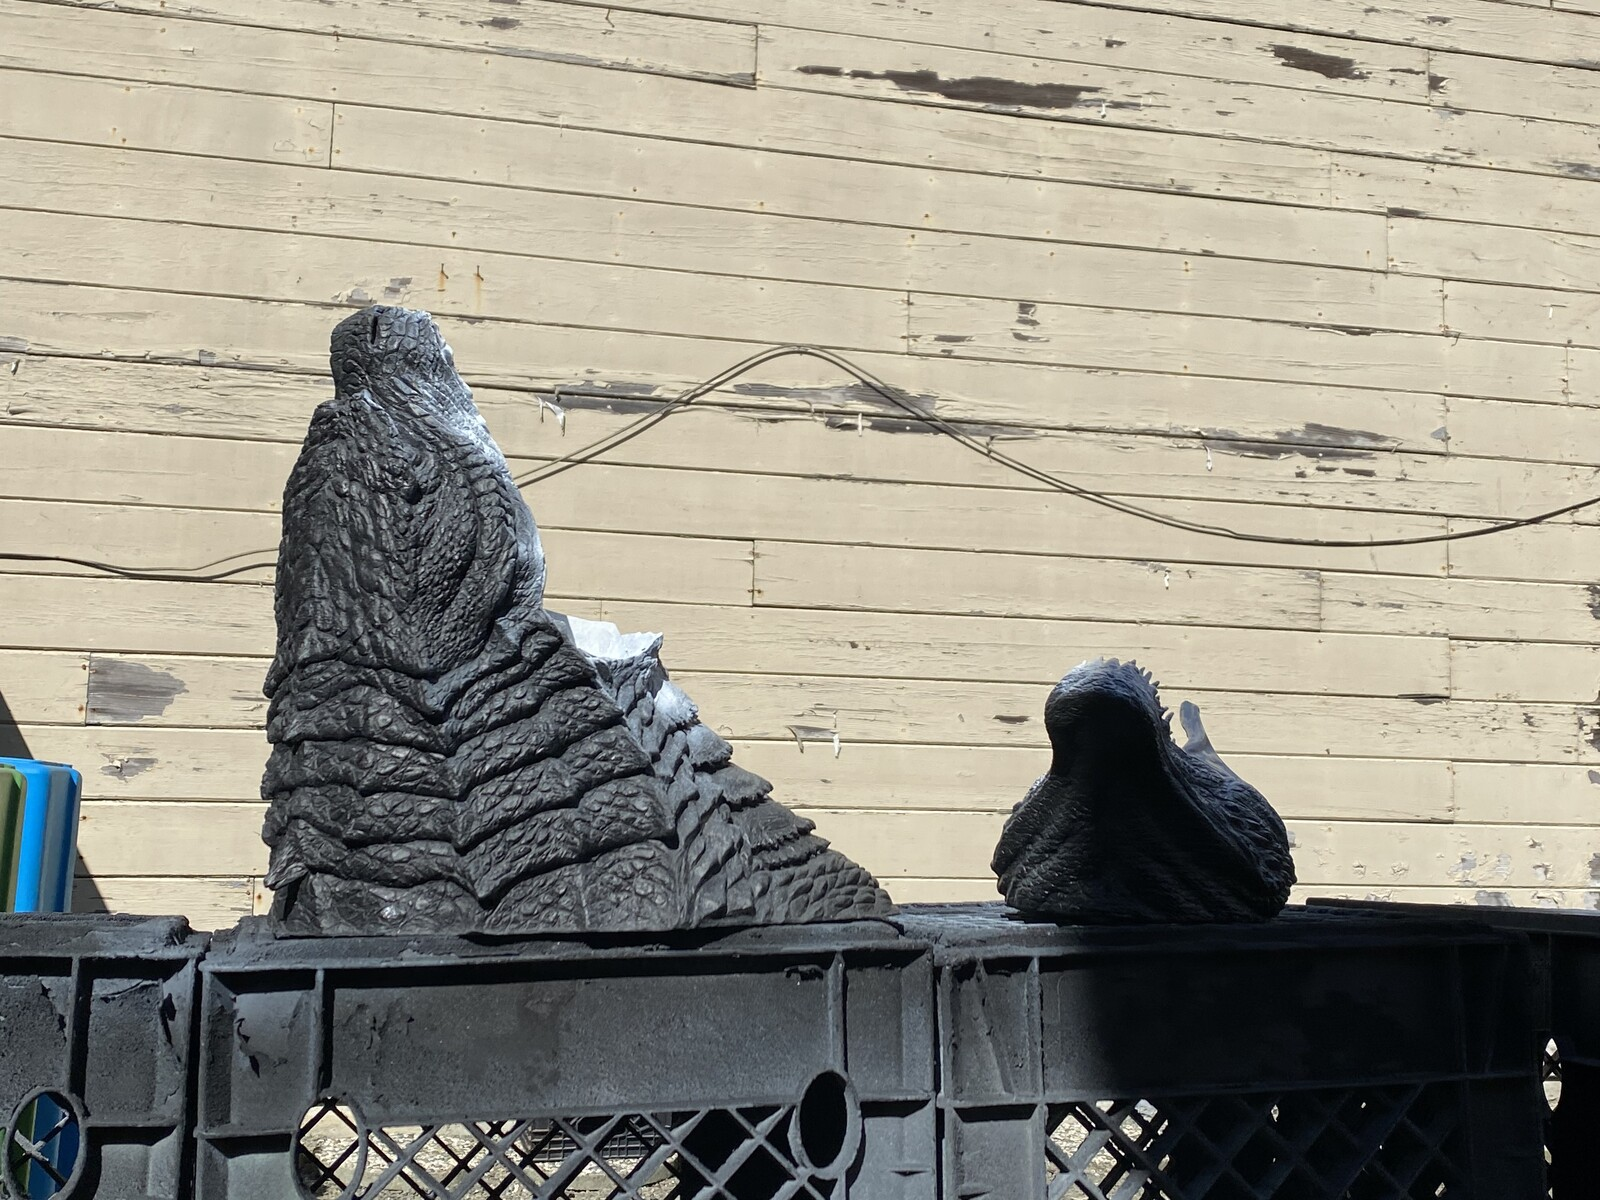 Godzilla 2014 Head Studio Scale W.I.P.  https://www.solidart.club/